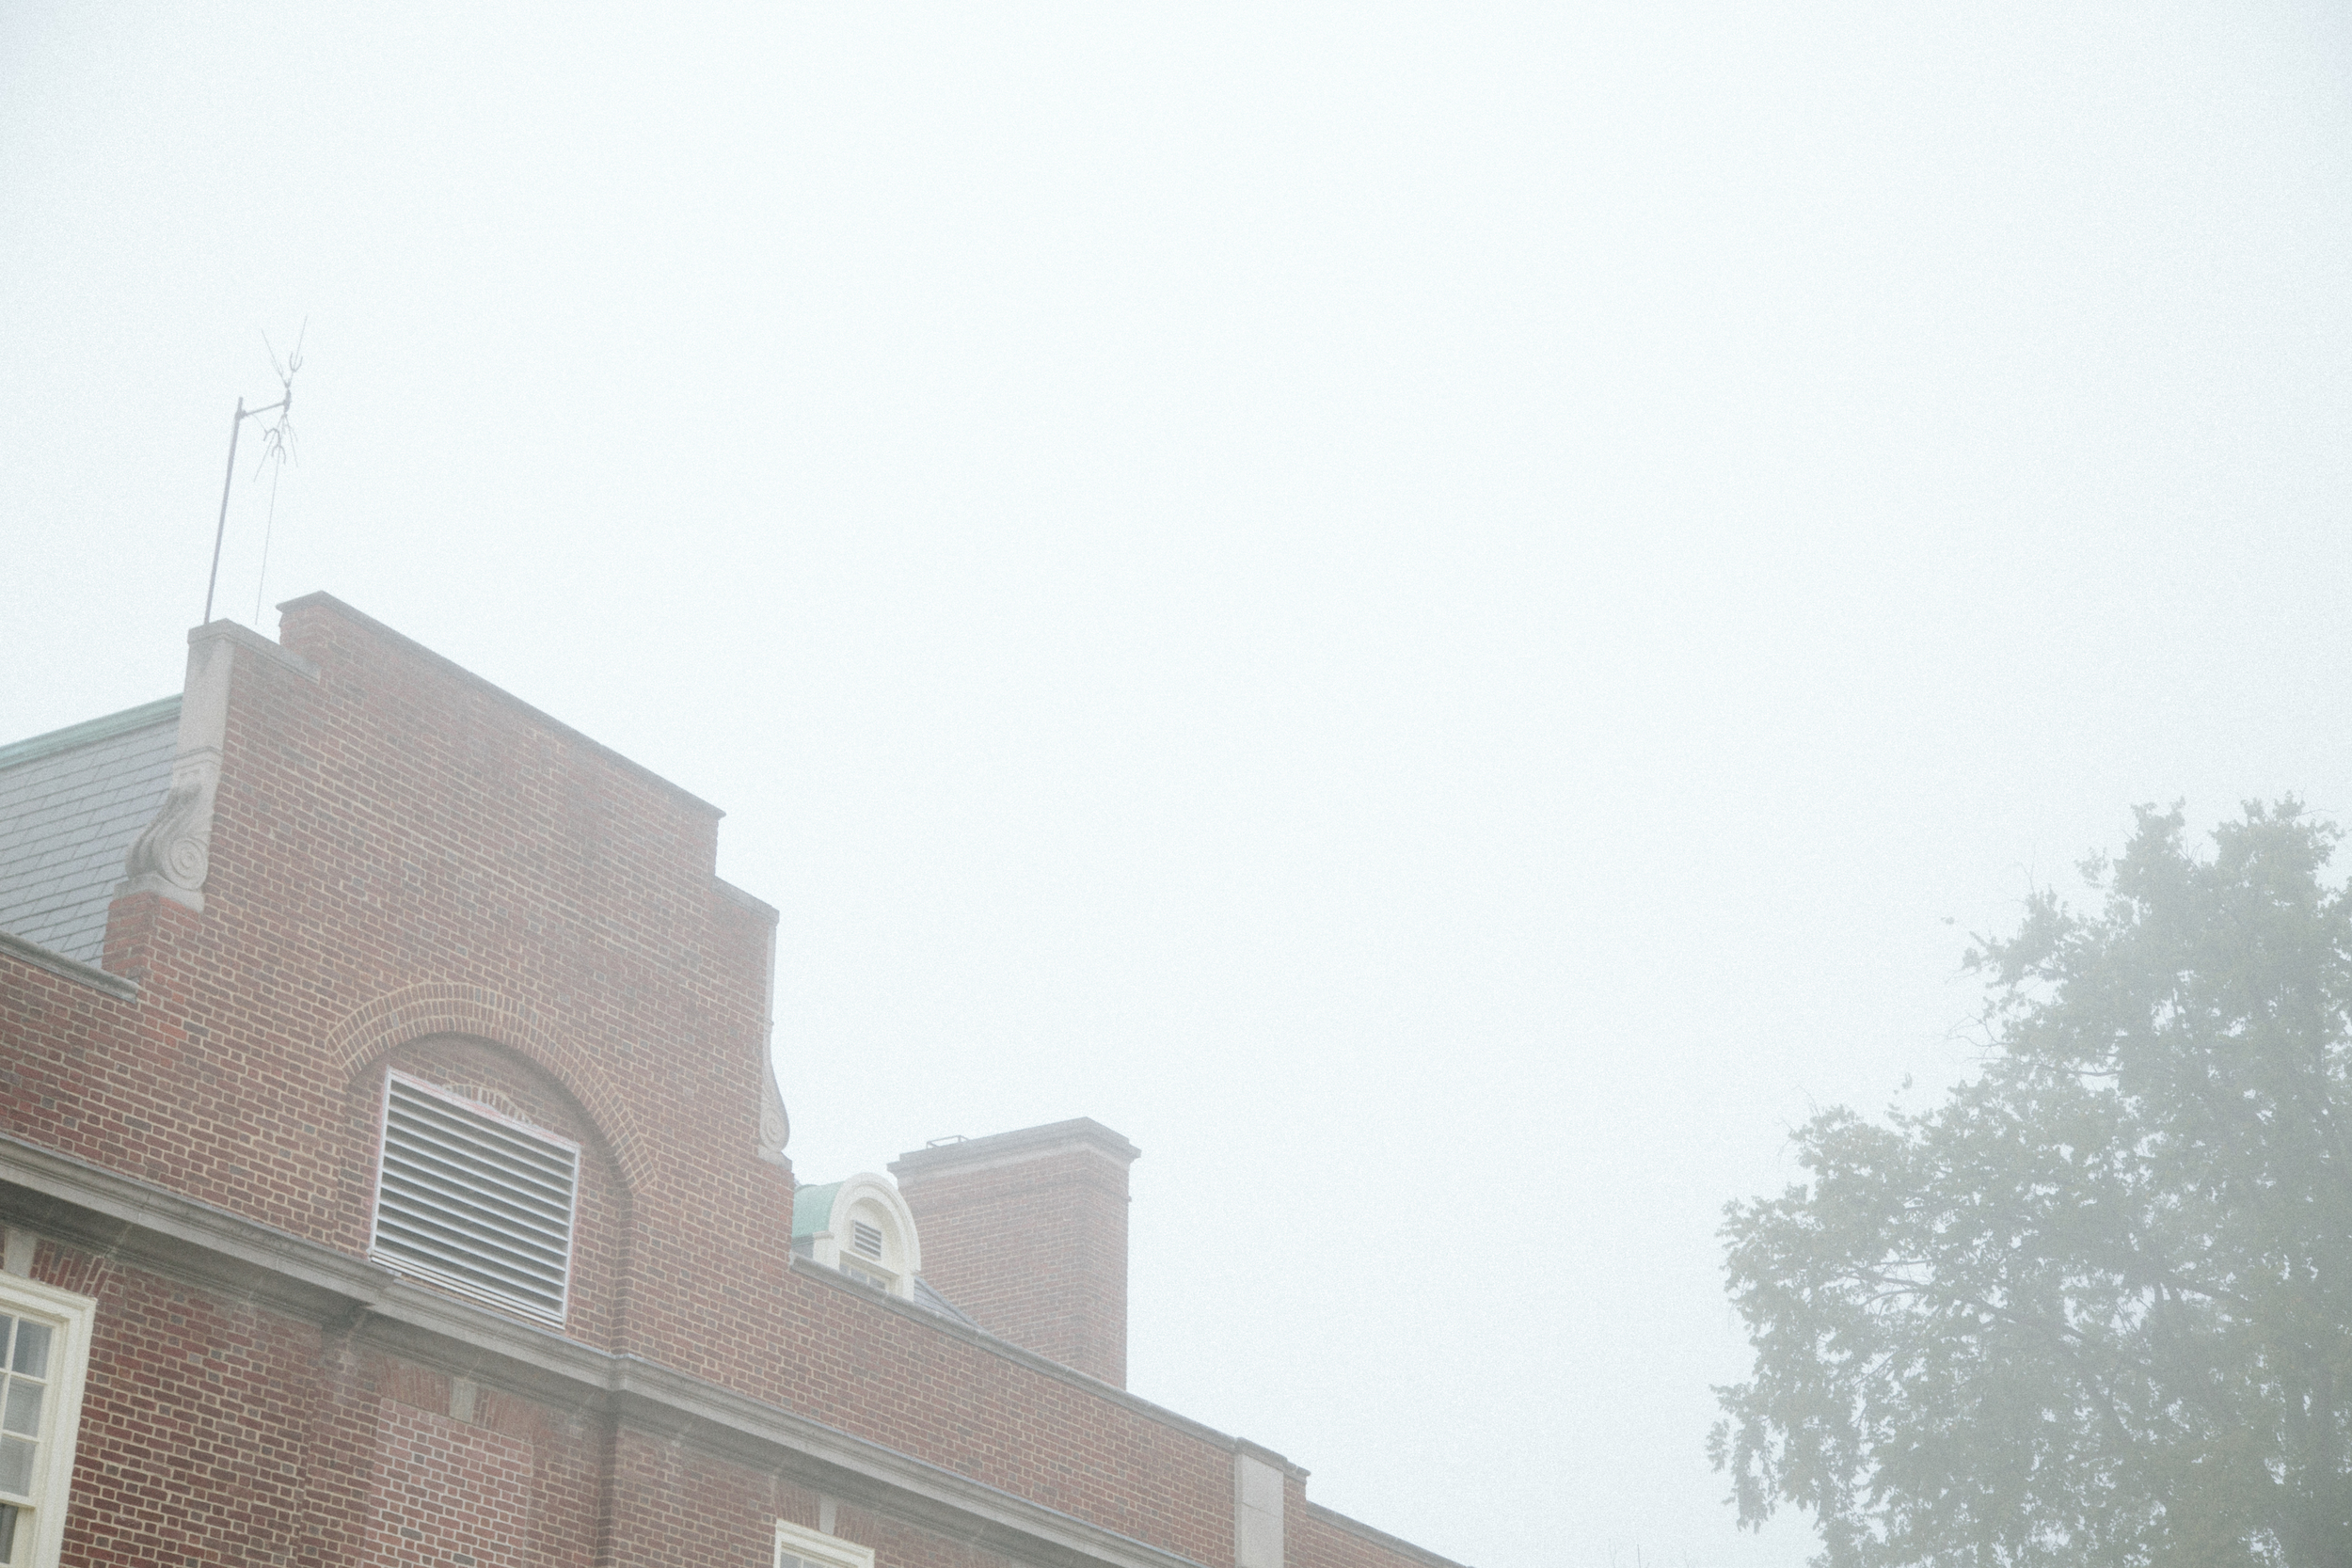 266 // 365 Foggy walk to work